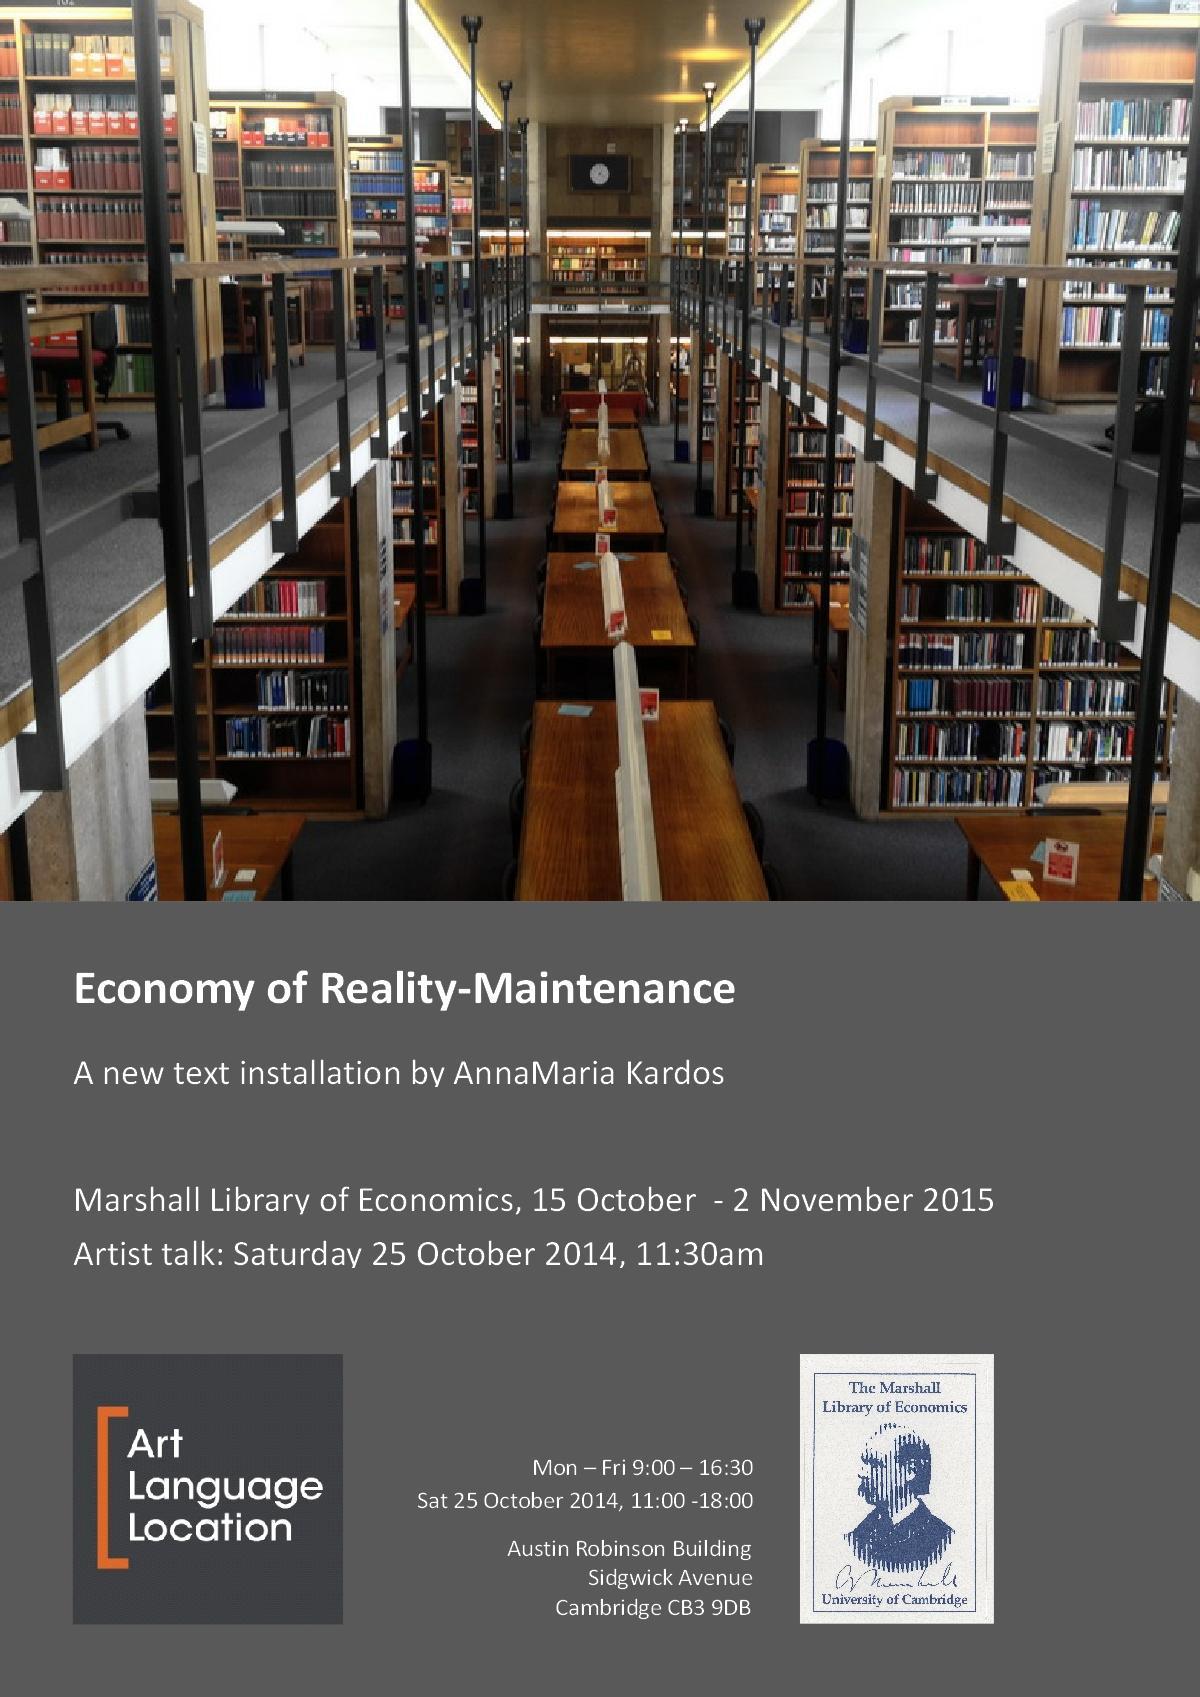 Economy of Reality-Maintenance, 2014 (art installation @ Marshall Library)